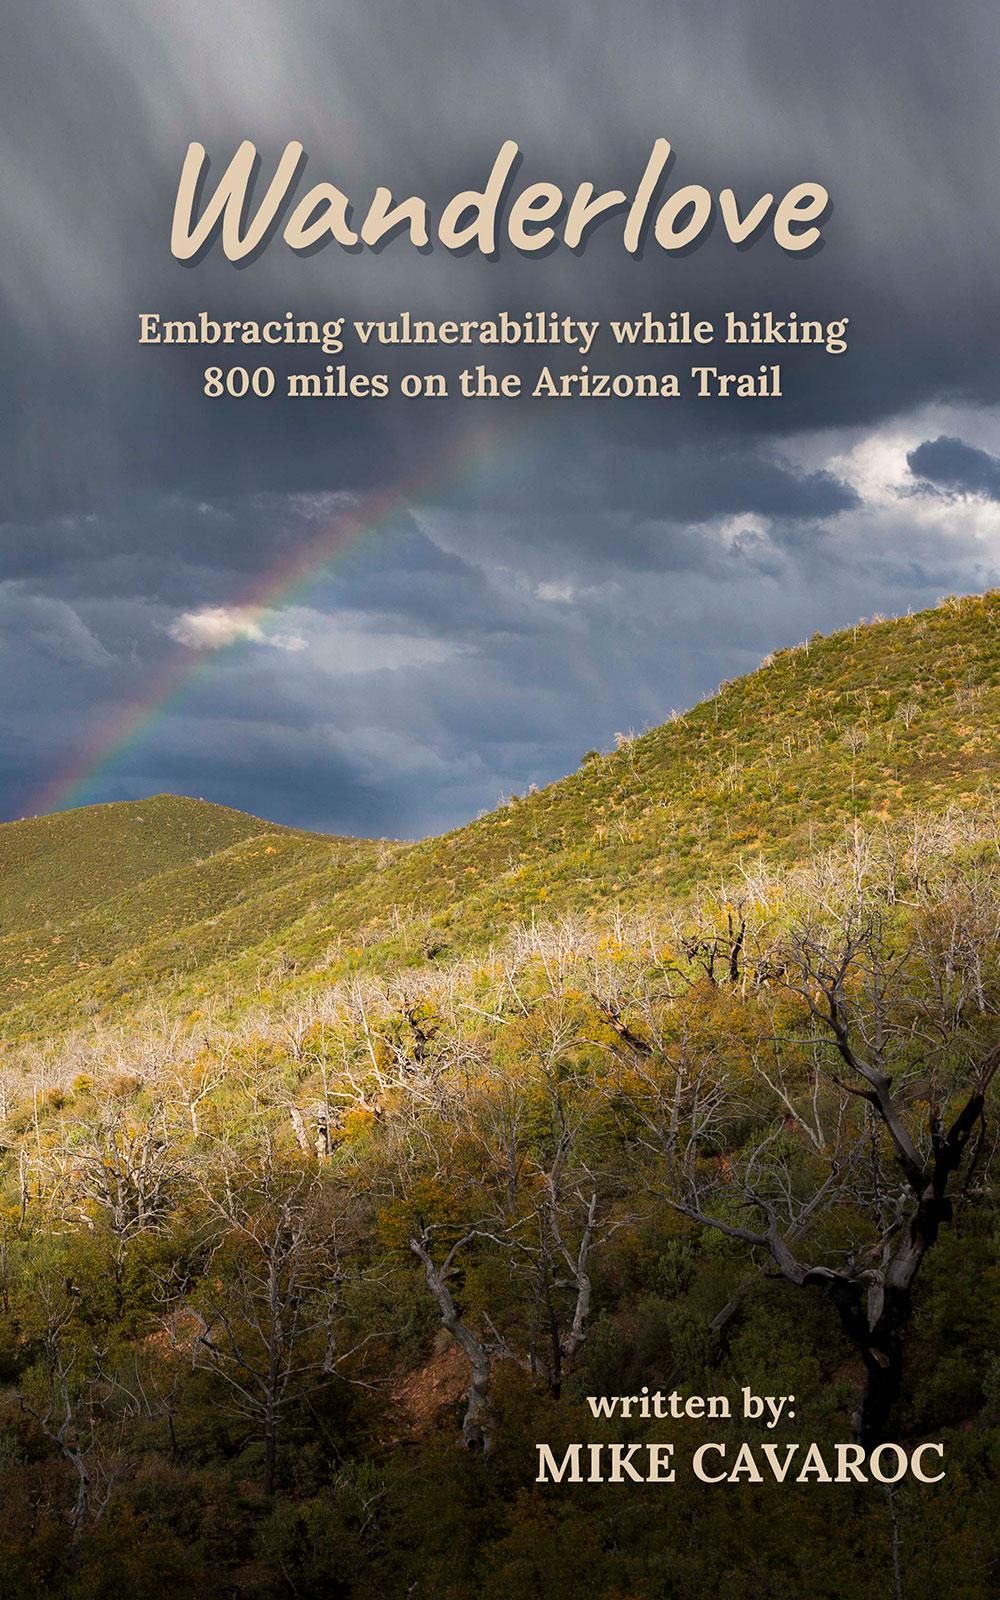 Wanderlove: Embracing vulnerability while hiking 800 miles on the Arizona Trail